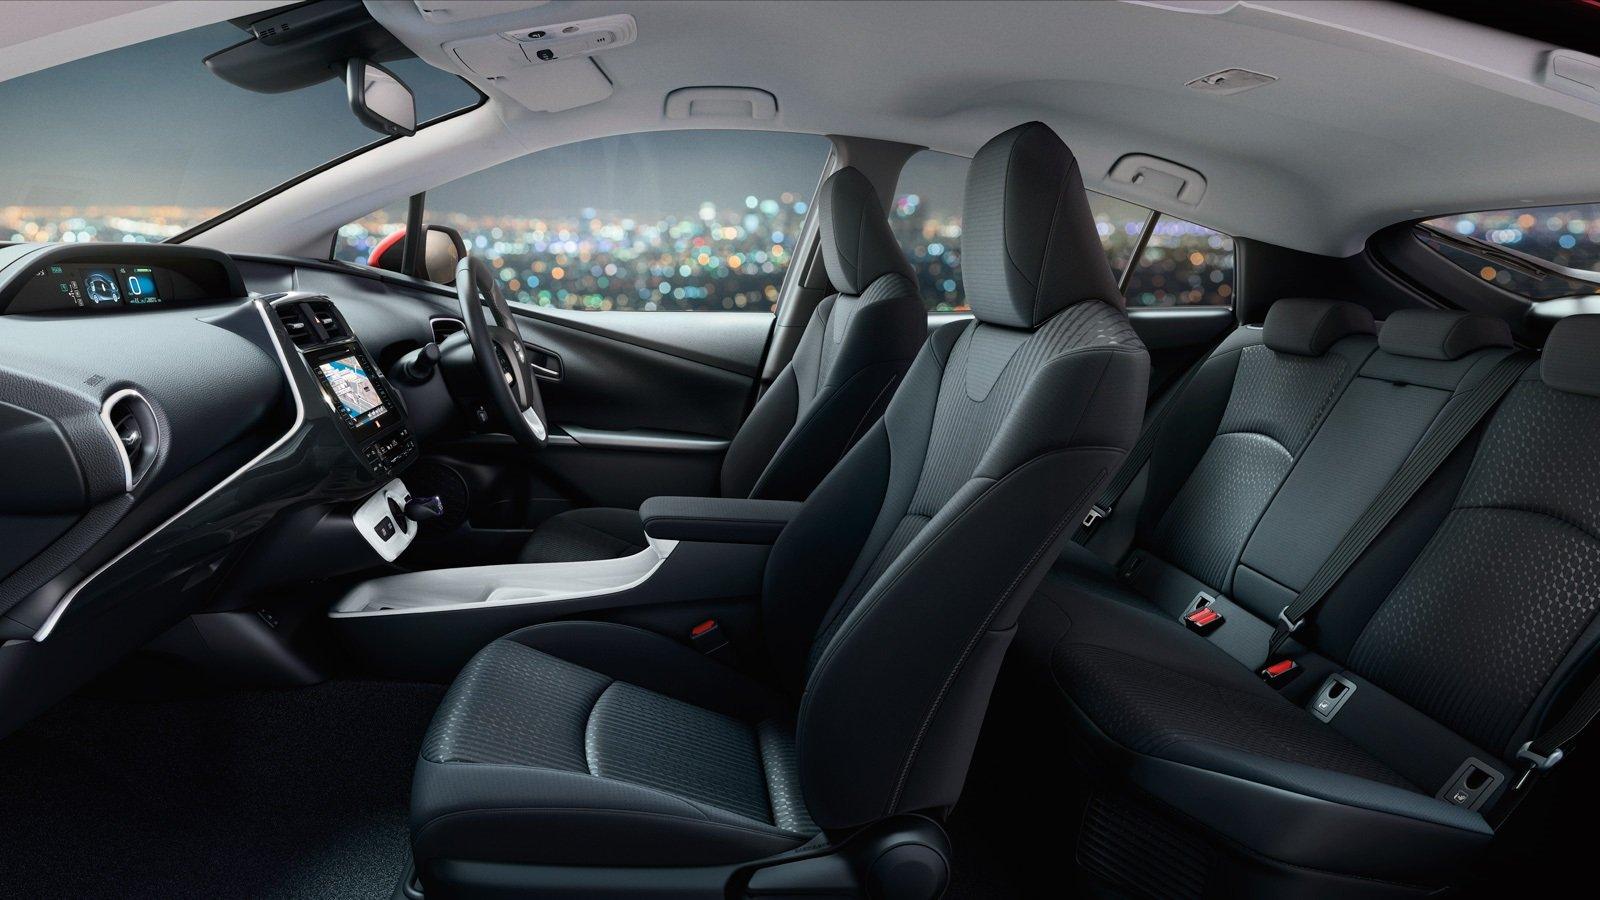 PCO Car hire London